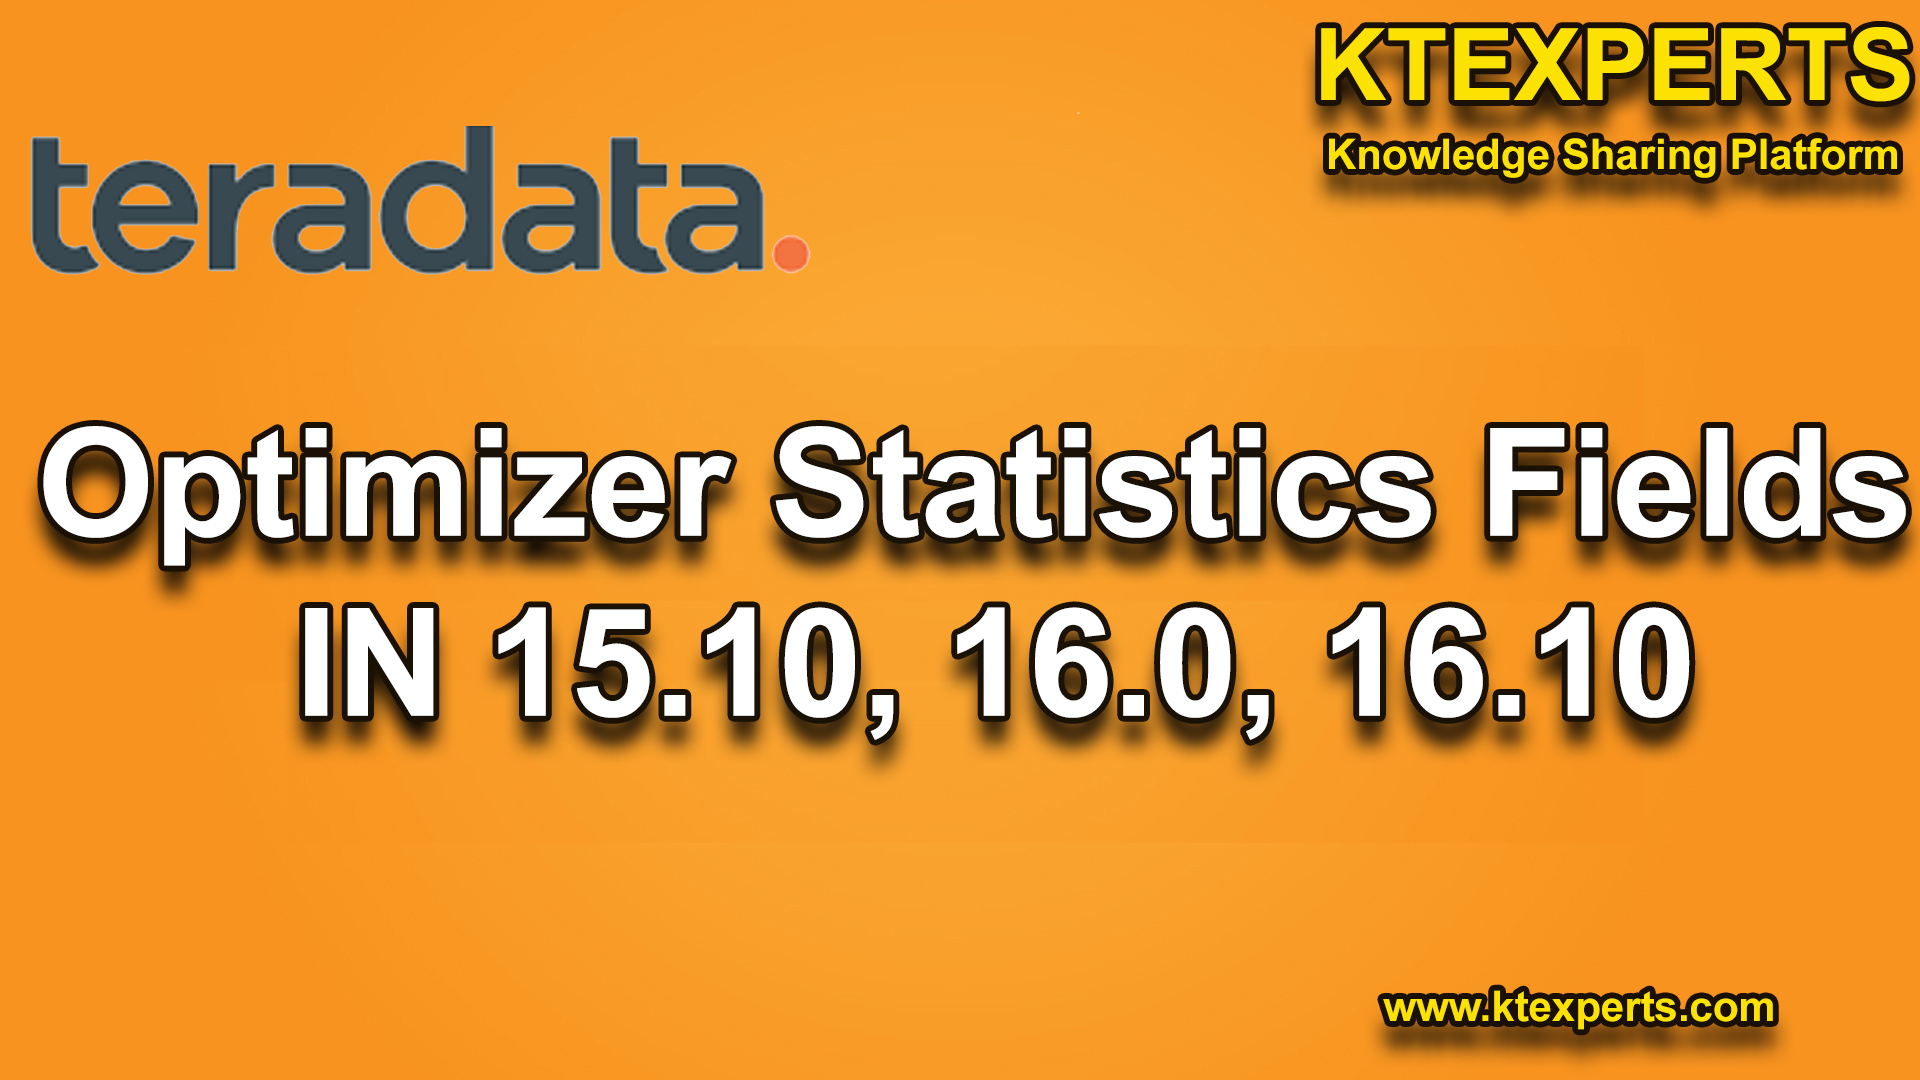 Optimizer Statistics Fields IN 15.10, 16.0, 16.10